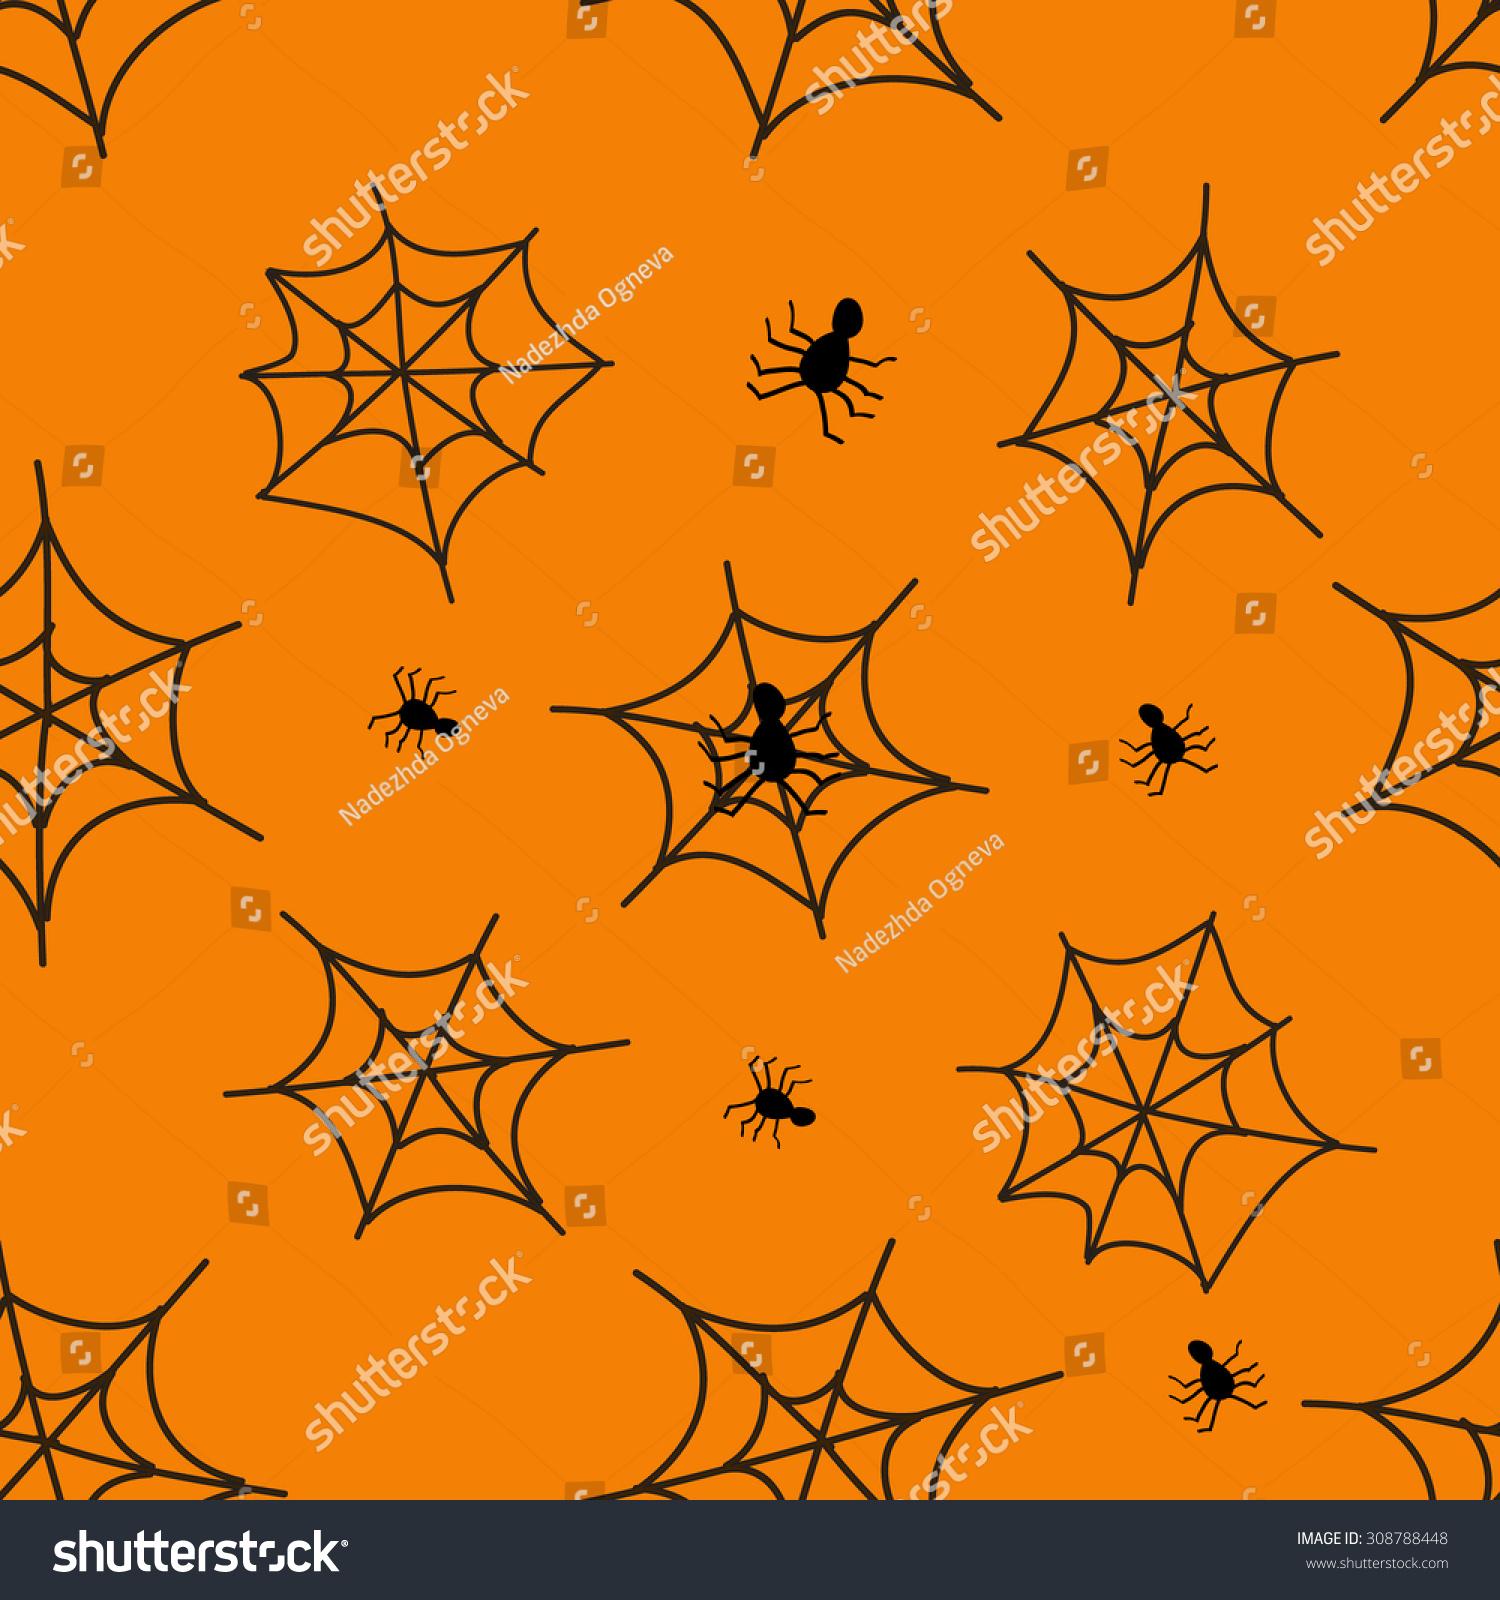 Simple Wallpaper Halloween Spider - stock-vector-halloween-black-spider-web-pattern-orange-background-seamless-vector-texture-for-textile-308788448  Snapshot_955353.jpg